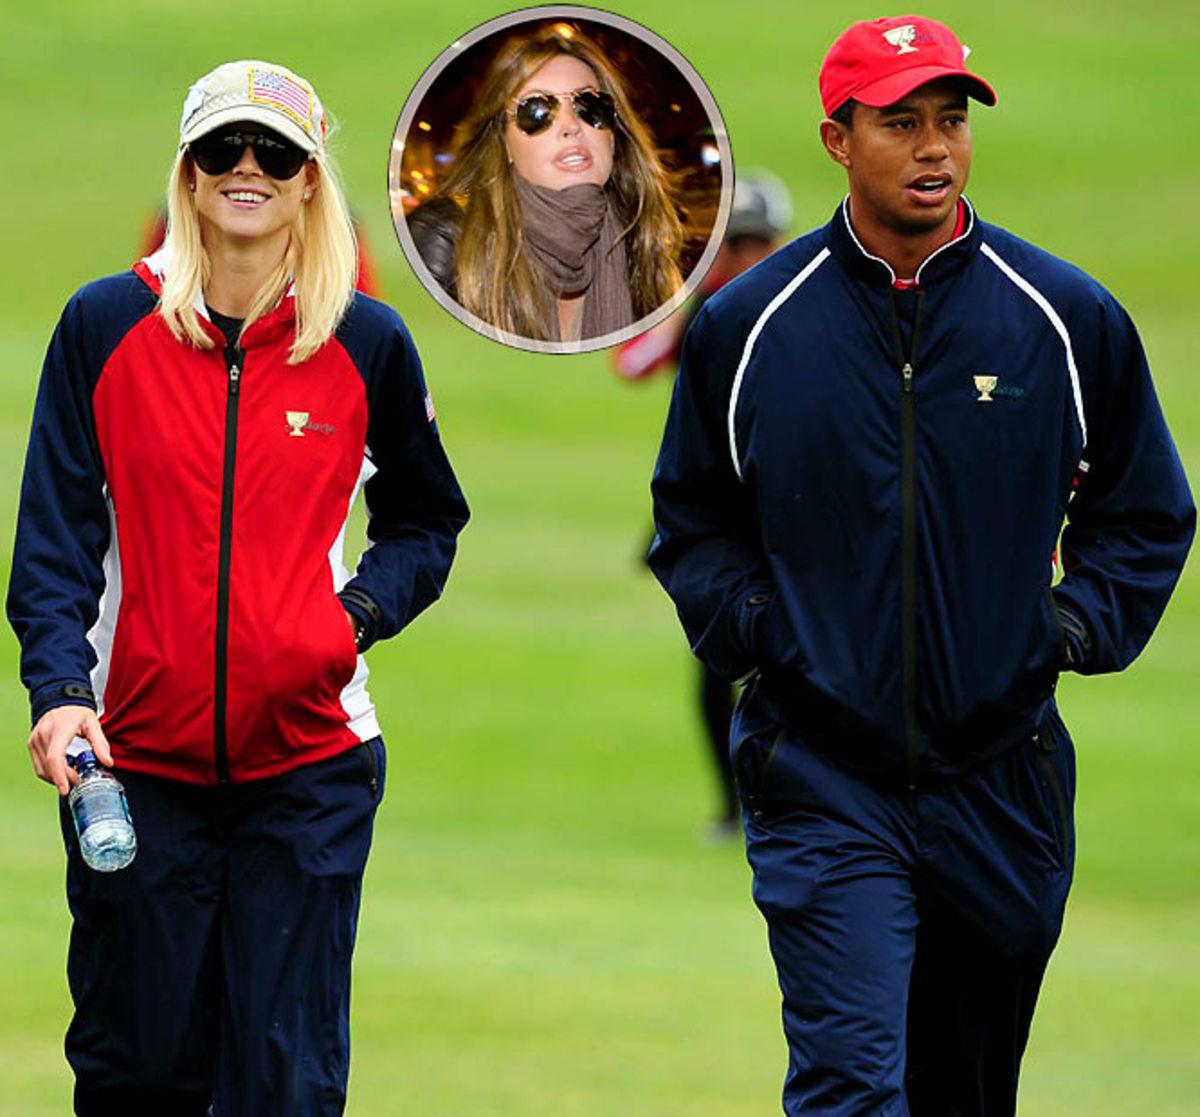 Tiger Woods And Rachel Uchitel : The Masters 2020 ...